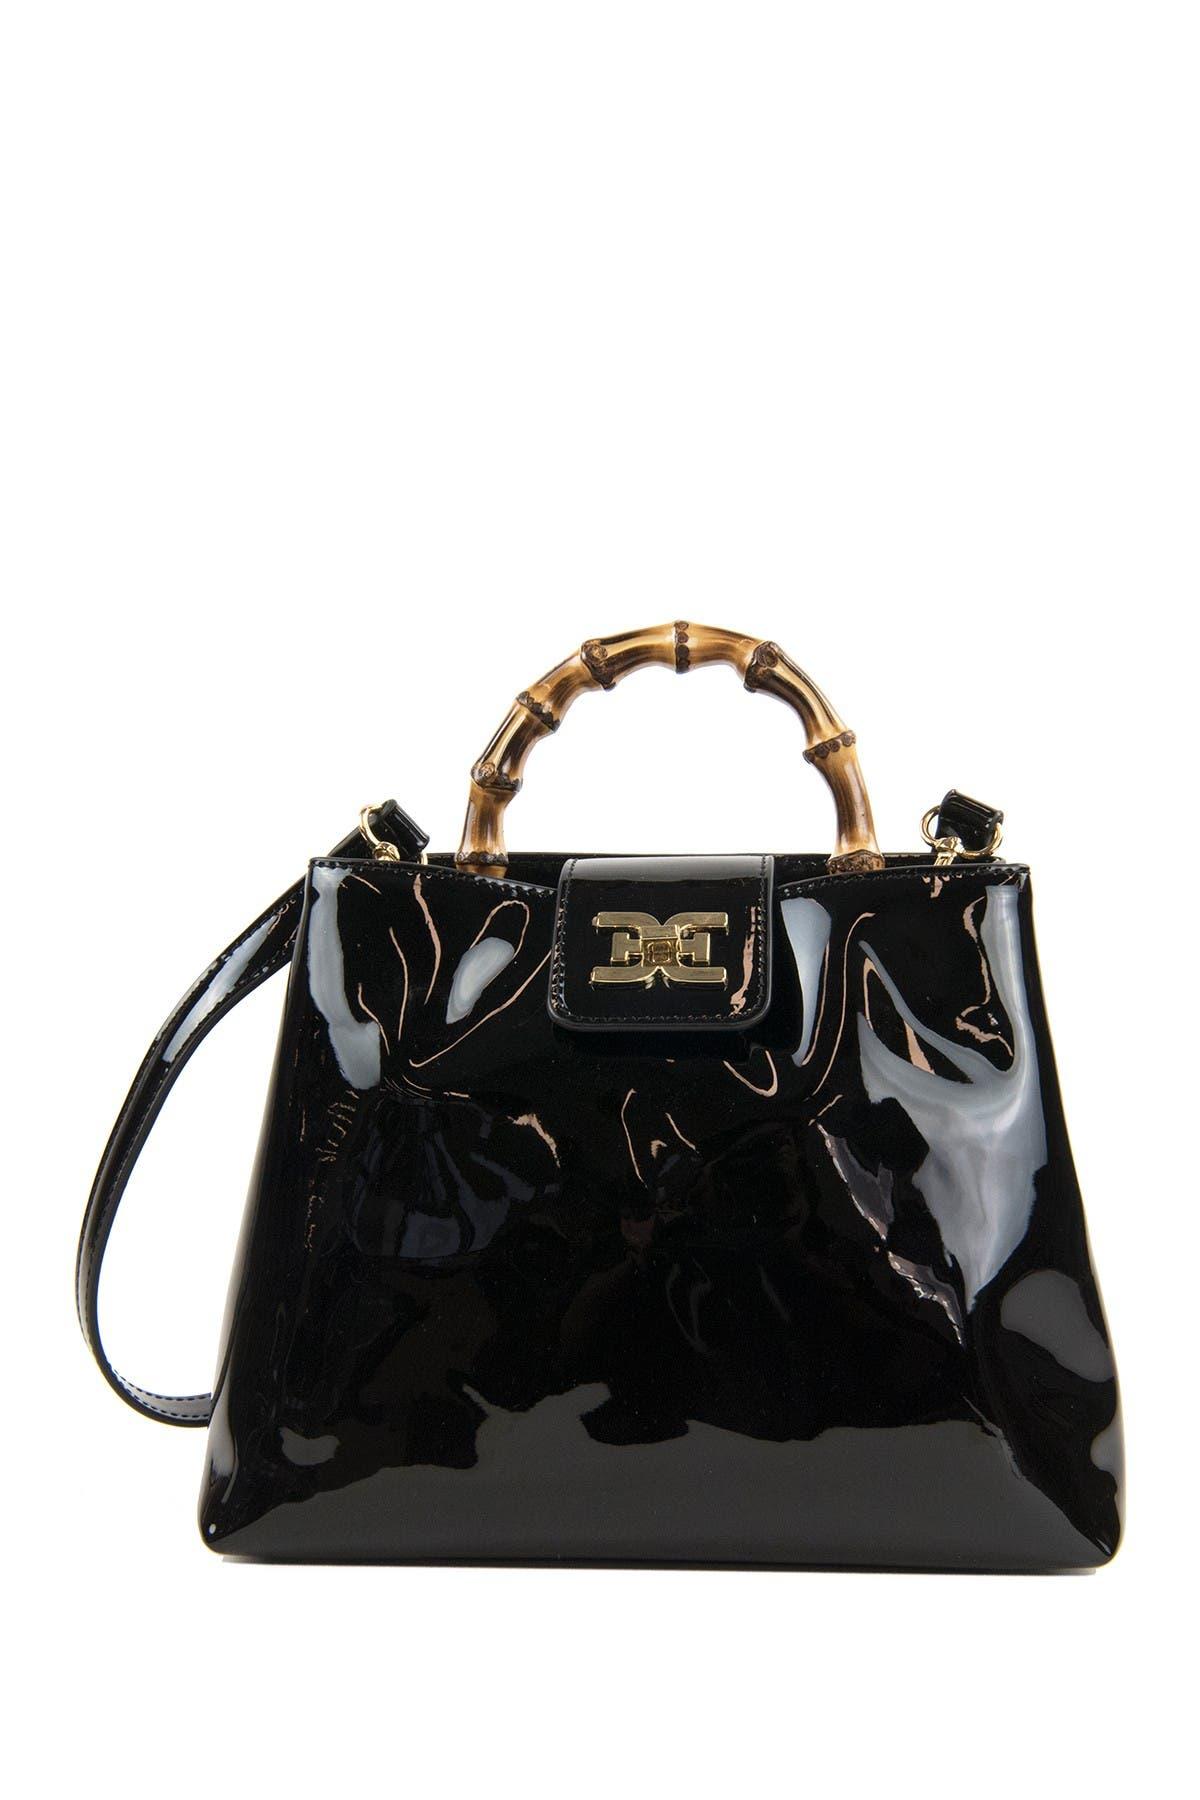 Sam Edelman Lois Top Handle Handbag